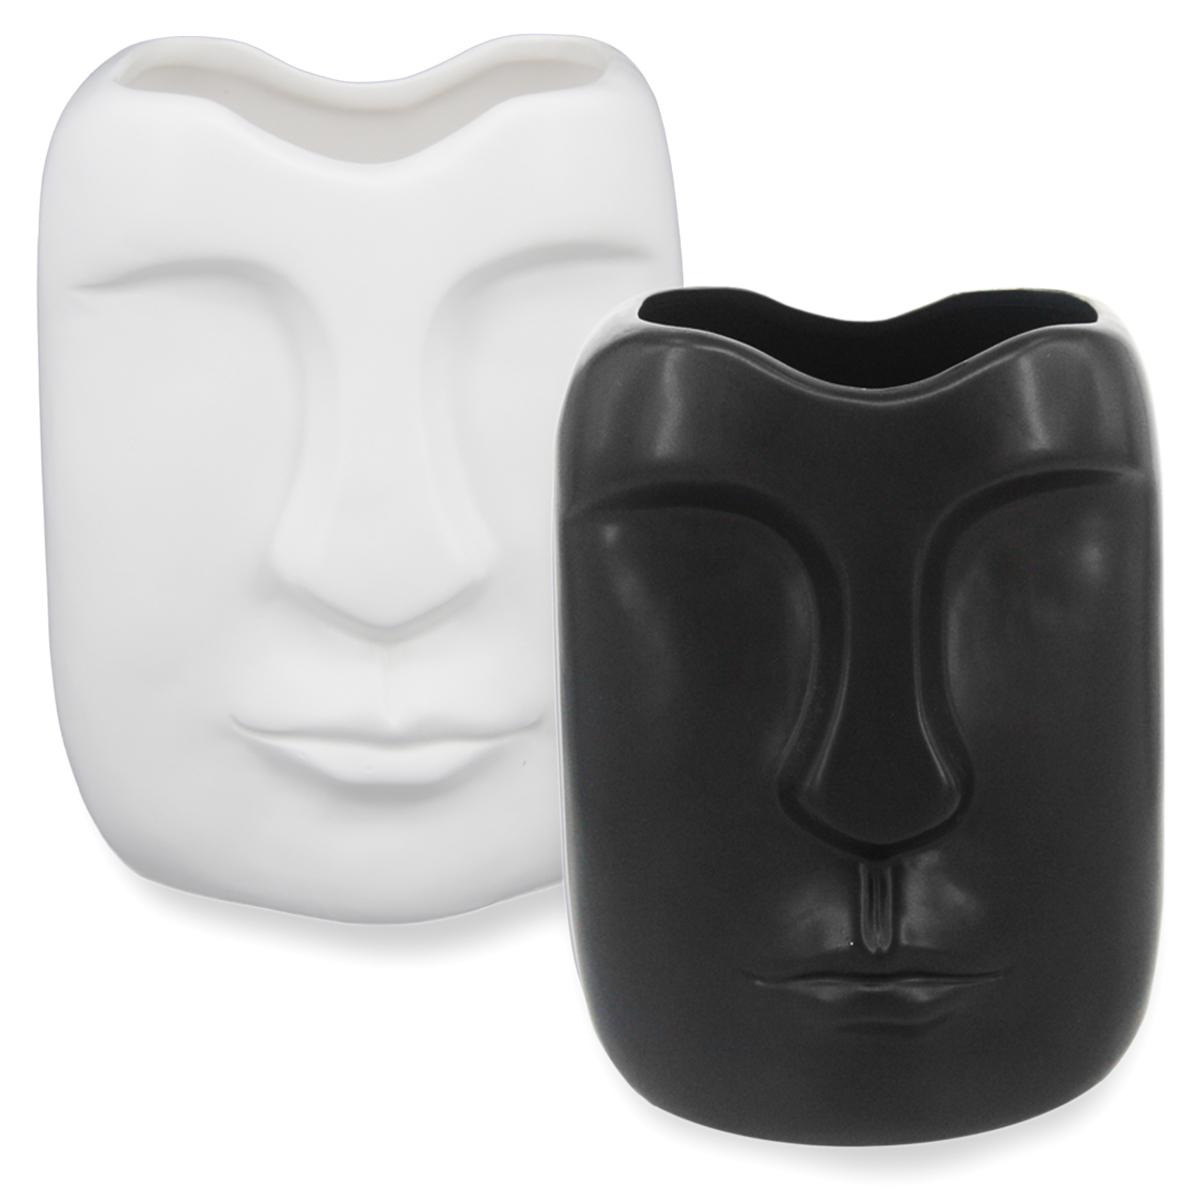 Kit 2 Vasos Cerâmica Rosto Branco 19x14x12 Preto14x11x9 BTC